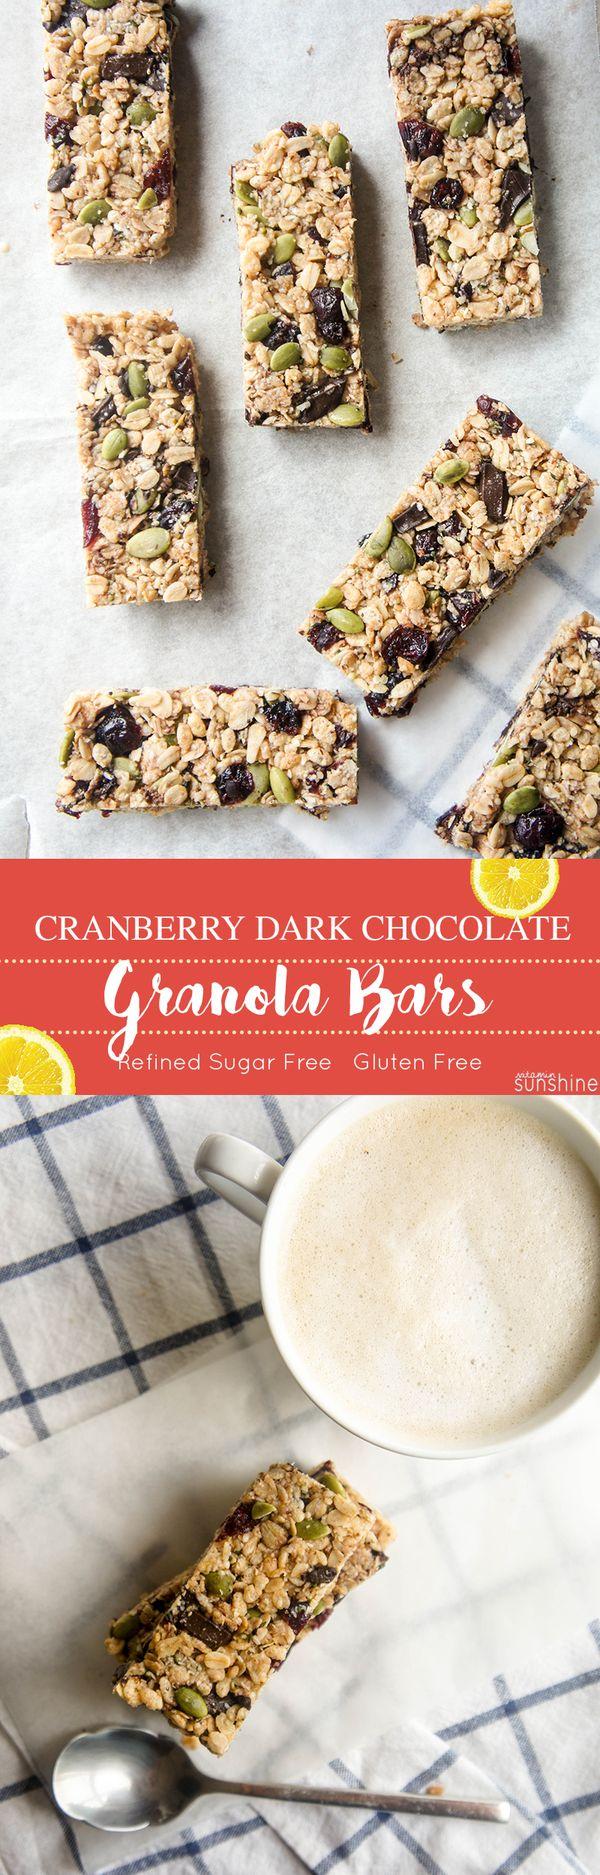 Cranberry Dark Chocolate Granola Bars (Gluten-Free, Refined Sugar-Free